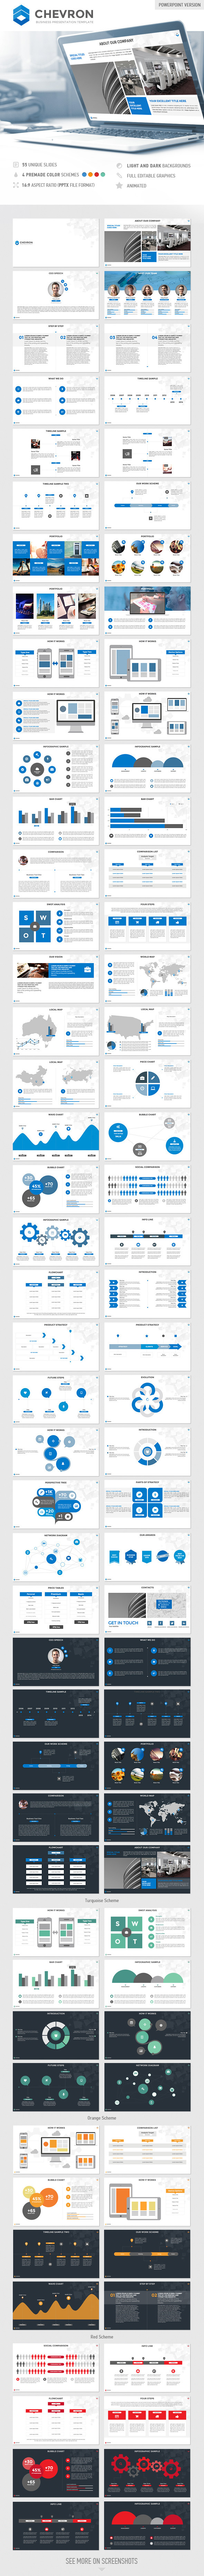 Chevron PowerPoint Presentation Template